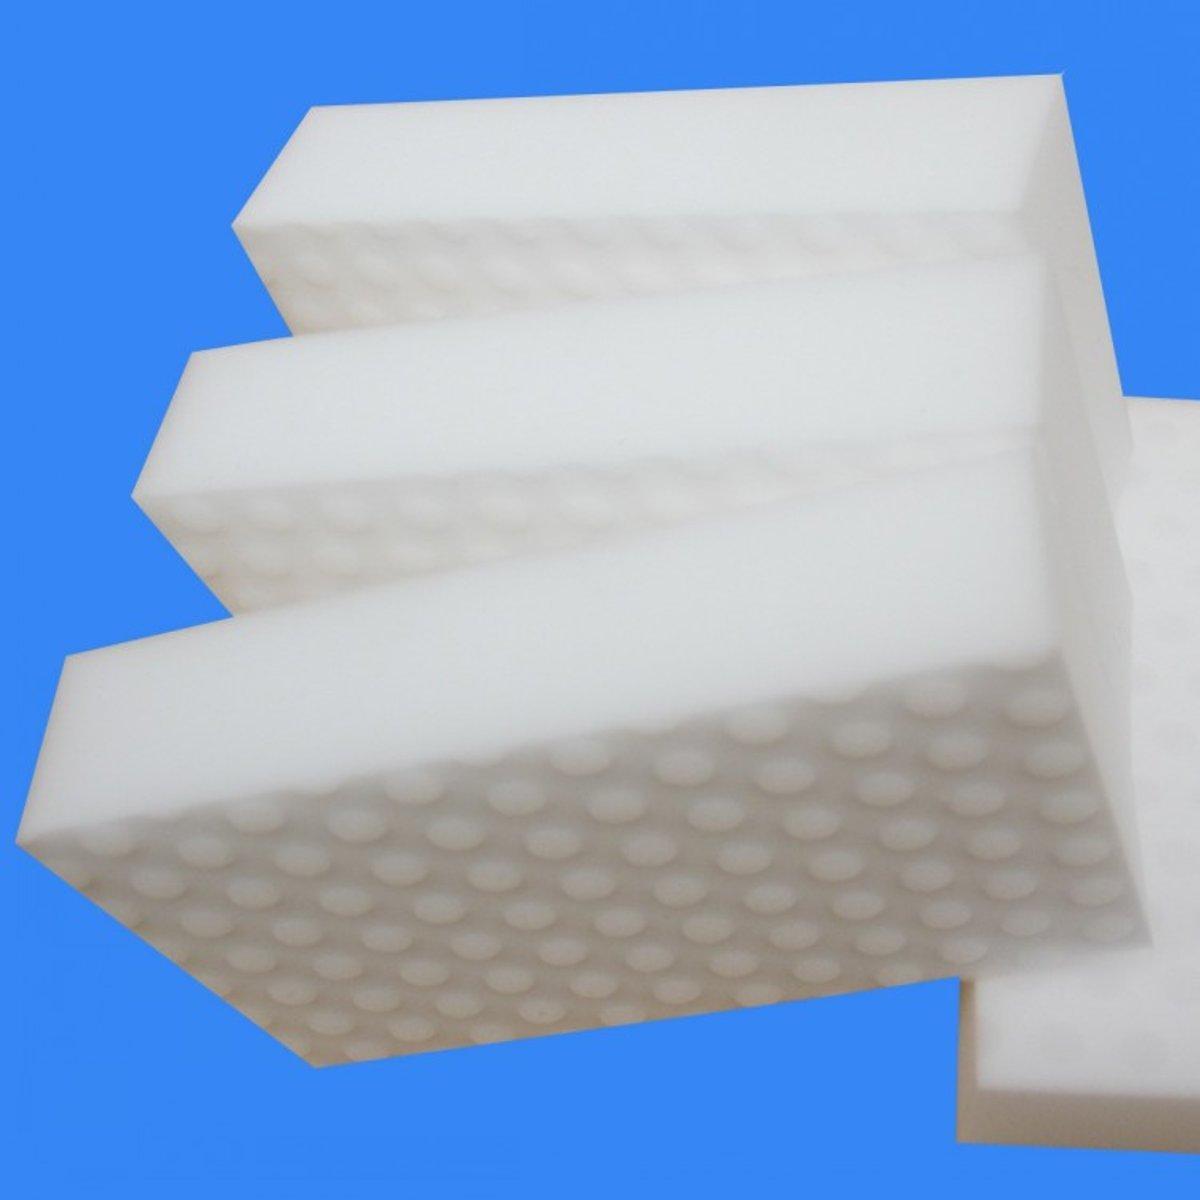 VANTEAM – 50 pcs/lot High density Compressed nano sponge, Cleaning Eraser Sponge, Melamine Foam Sponges, multi-functional Cleaning 100x60x20mm.